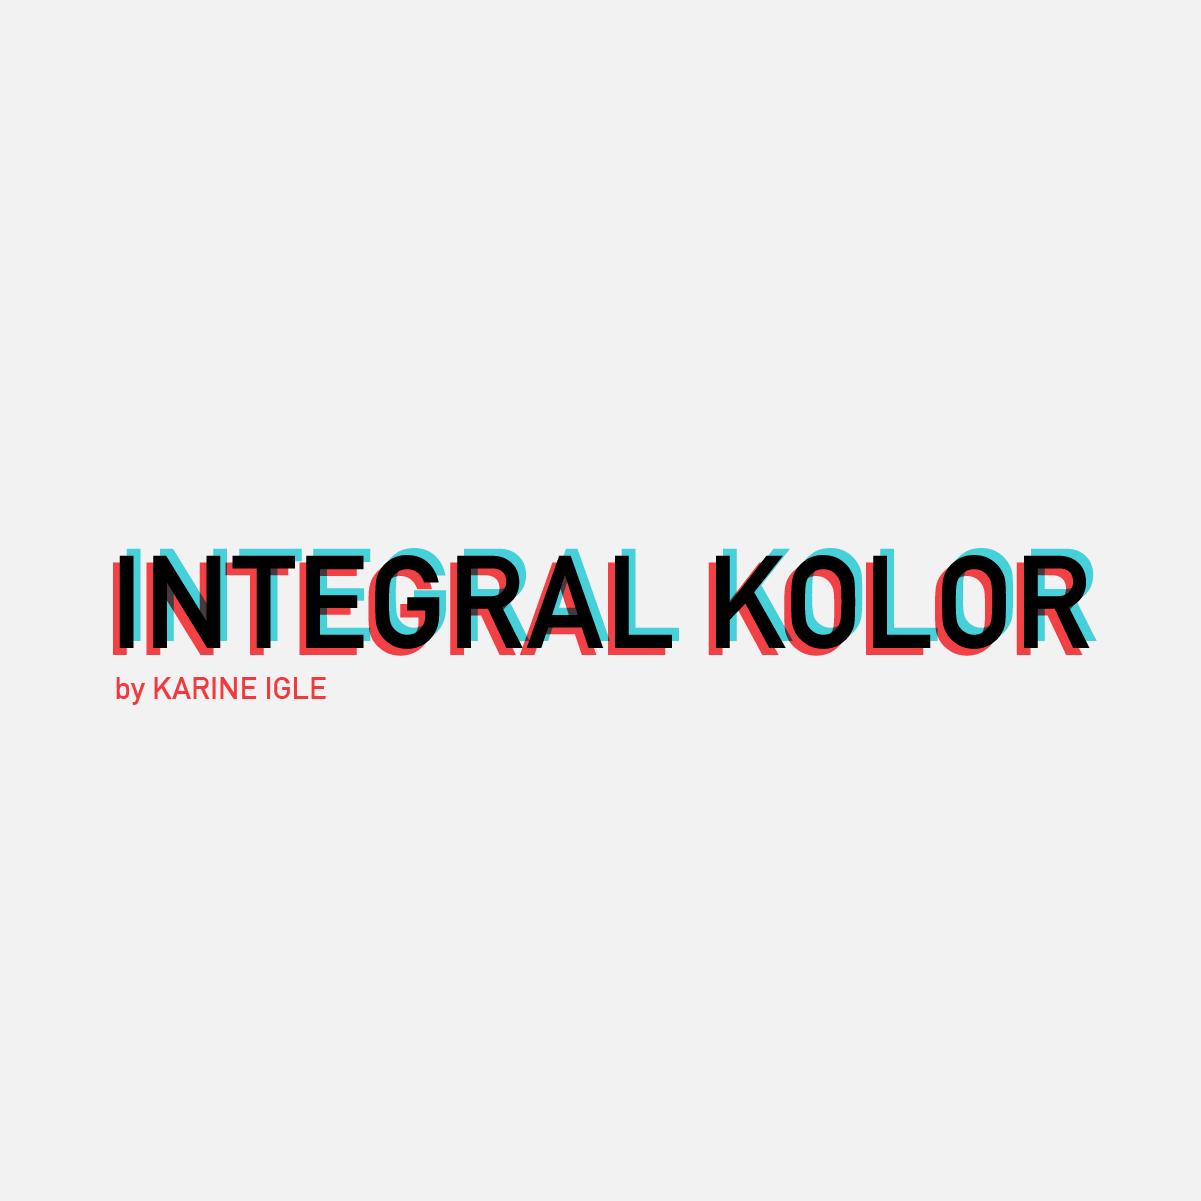 INTEGRAL KOLOR LLC